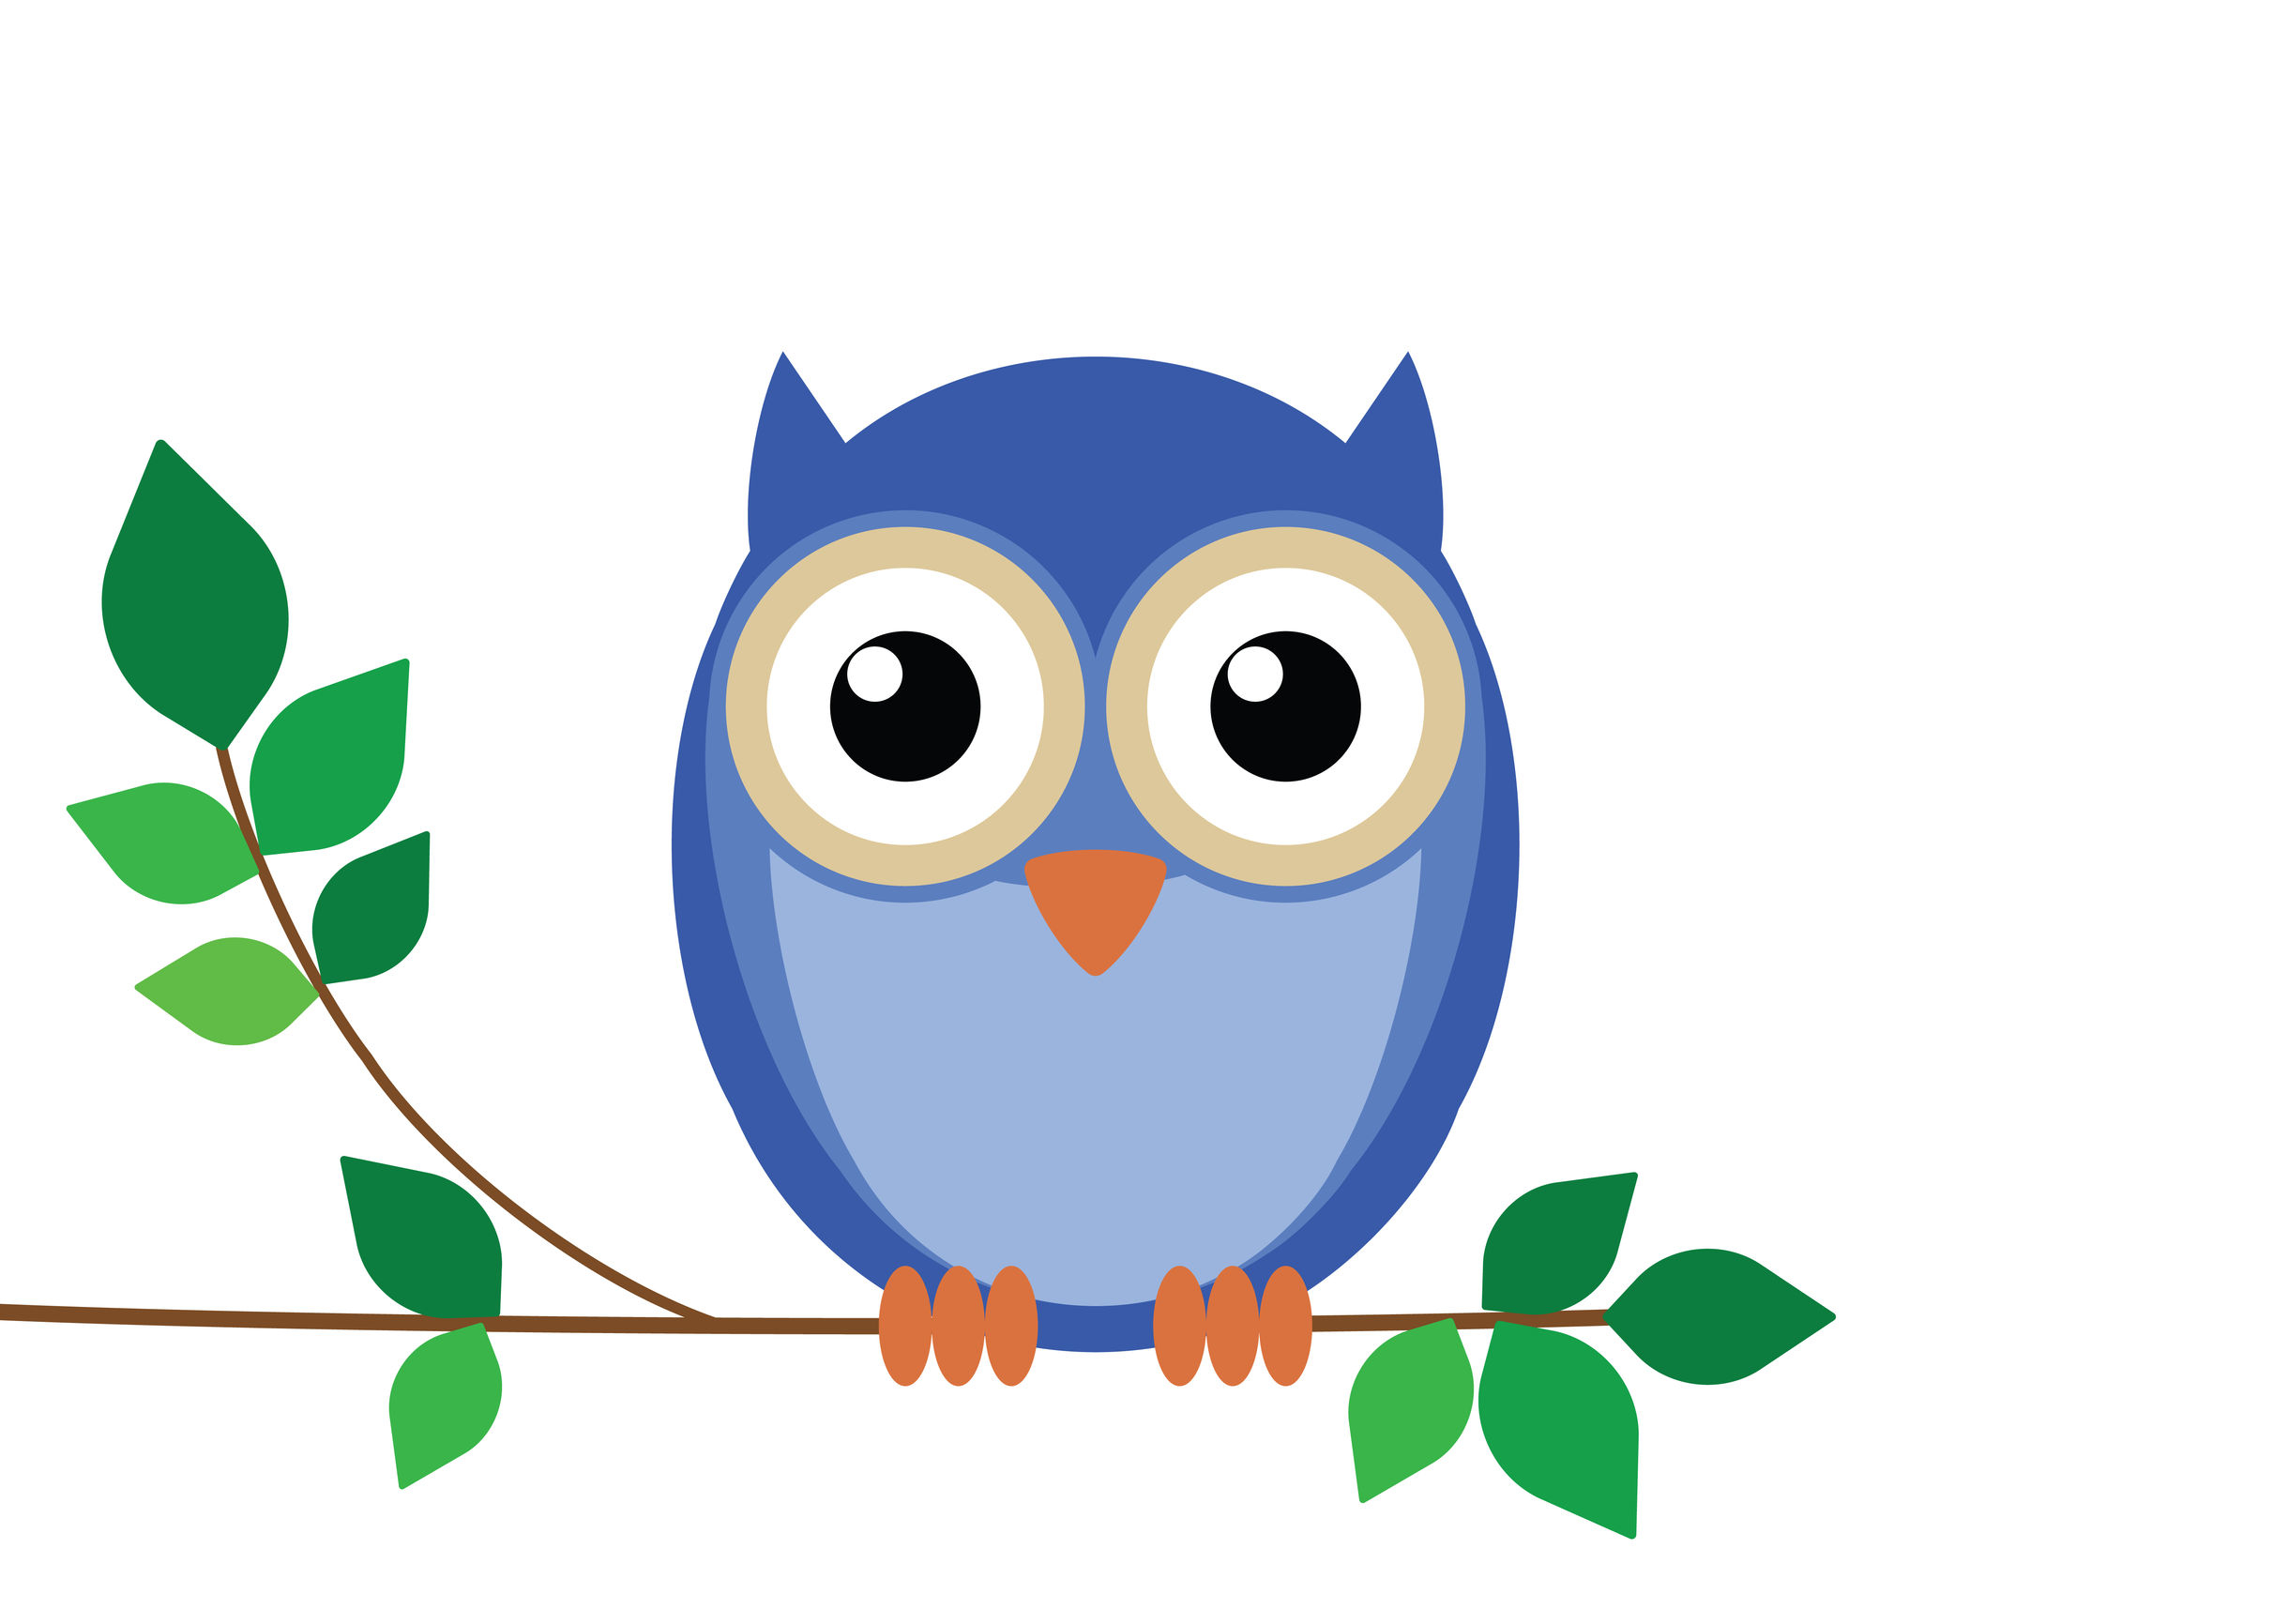 Printables clipart svg freeuse stock Printable Owl Clipart - Clipart Kid svg freeuse stock